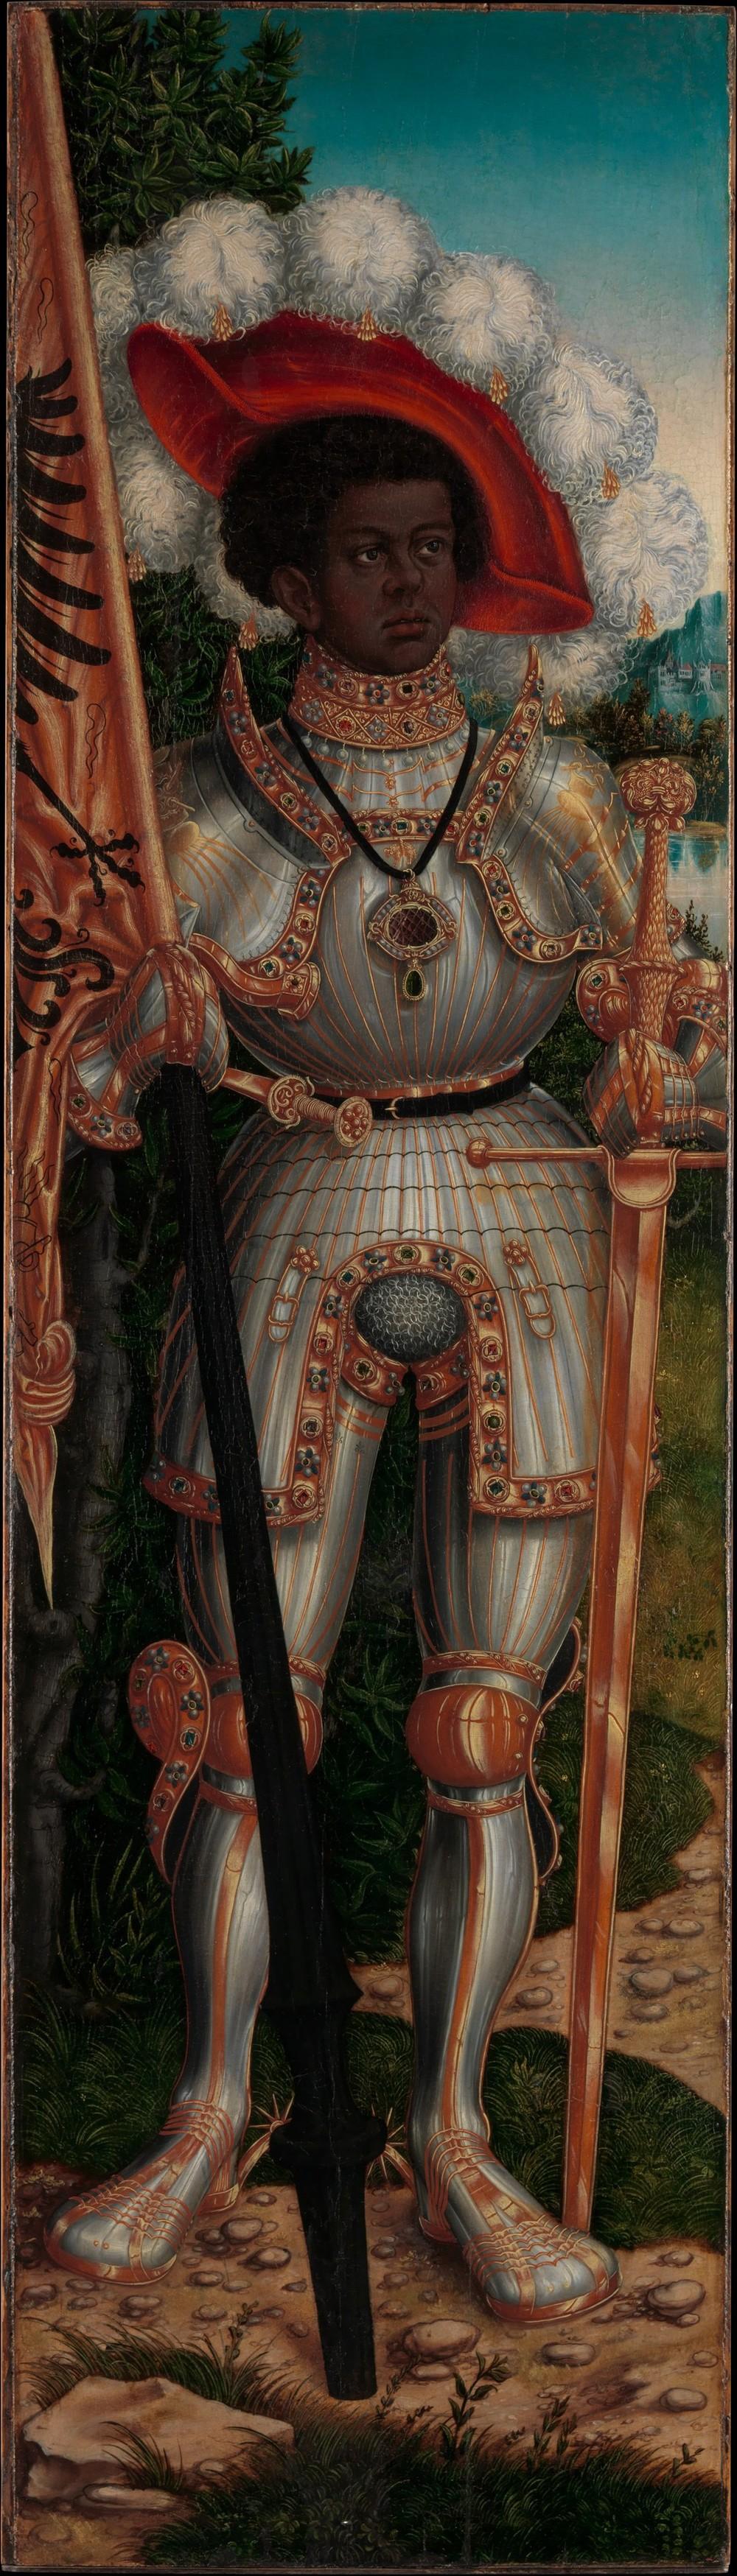 Cranach'sSaint Maurice -http://www.metmuseum.org/exhibitions/listings/2015/cranach-saint-maurice